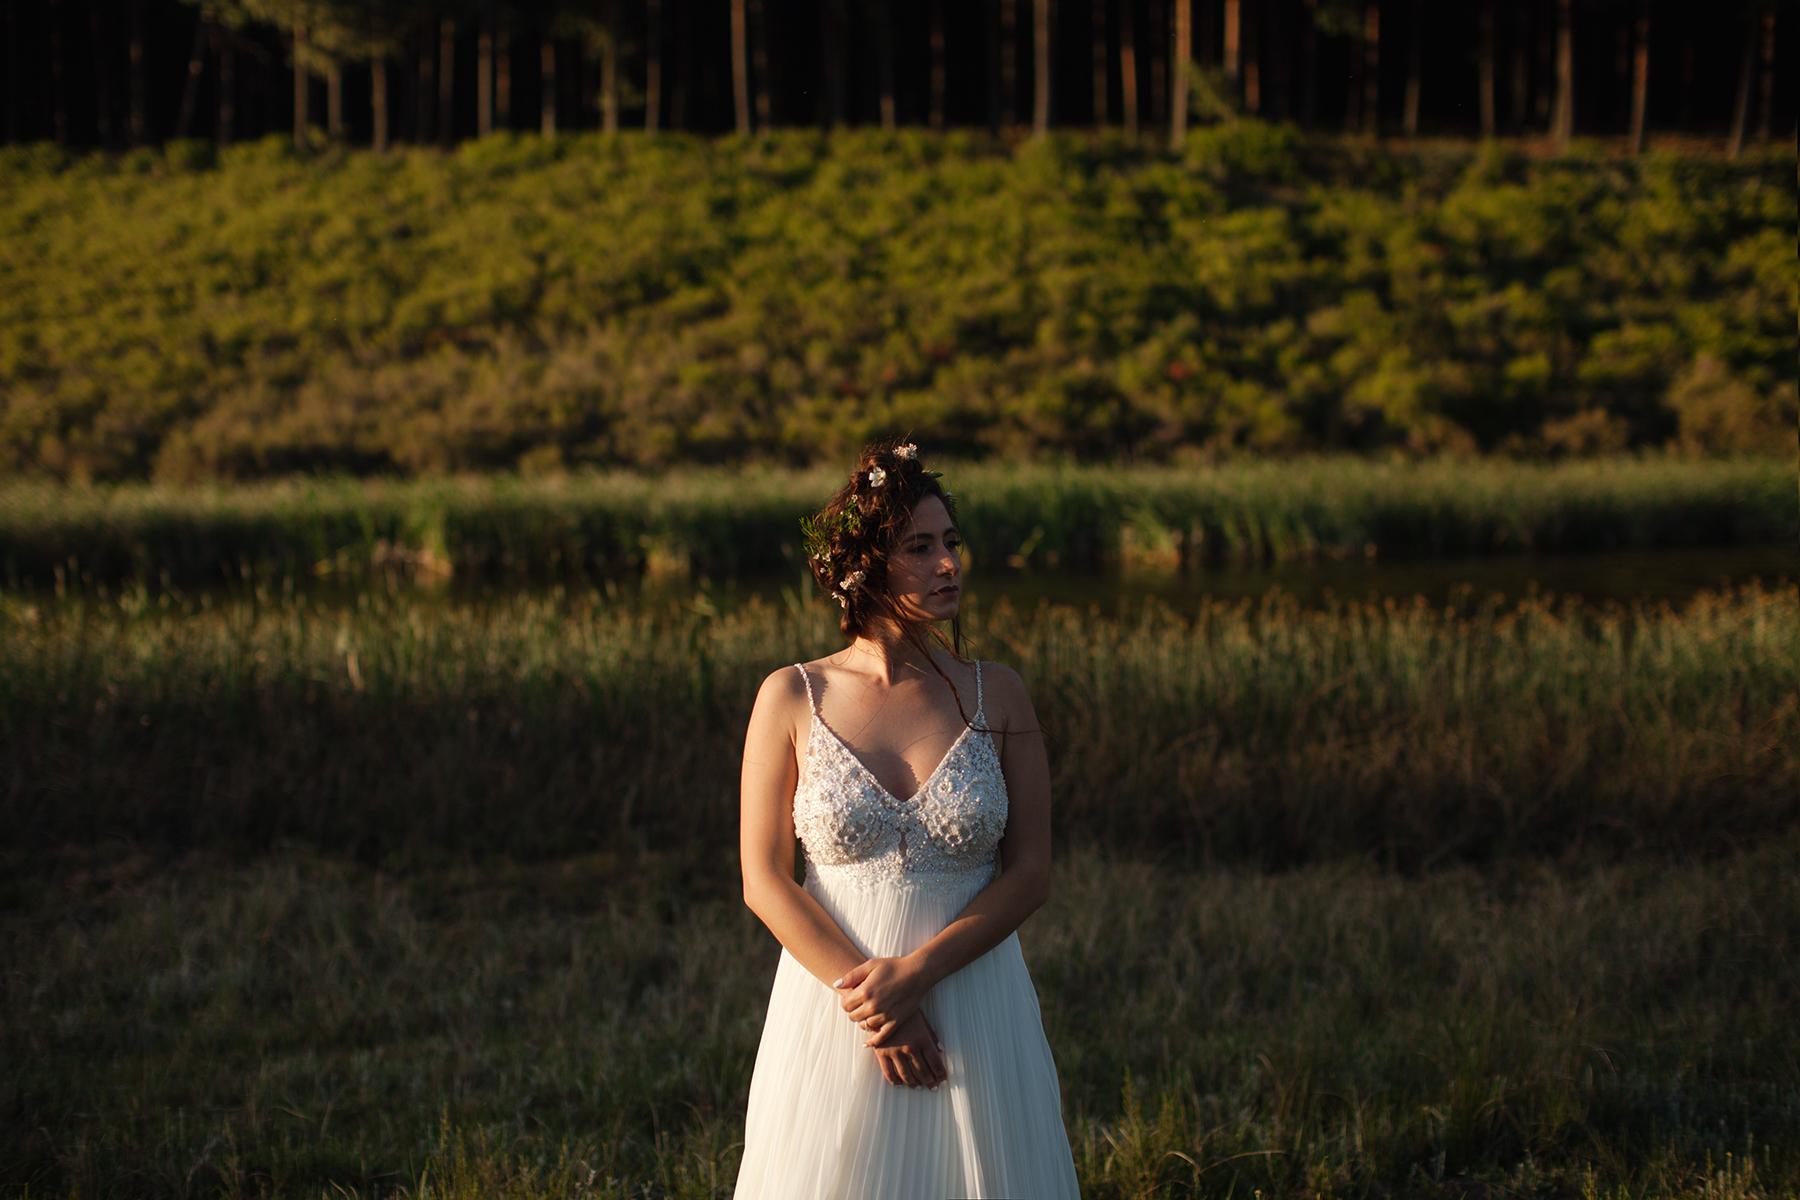 Bridal11Nov2018_HMP_49_Web.jpg